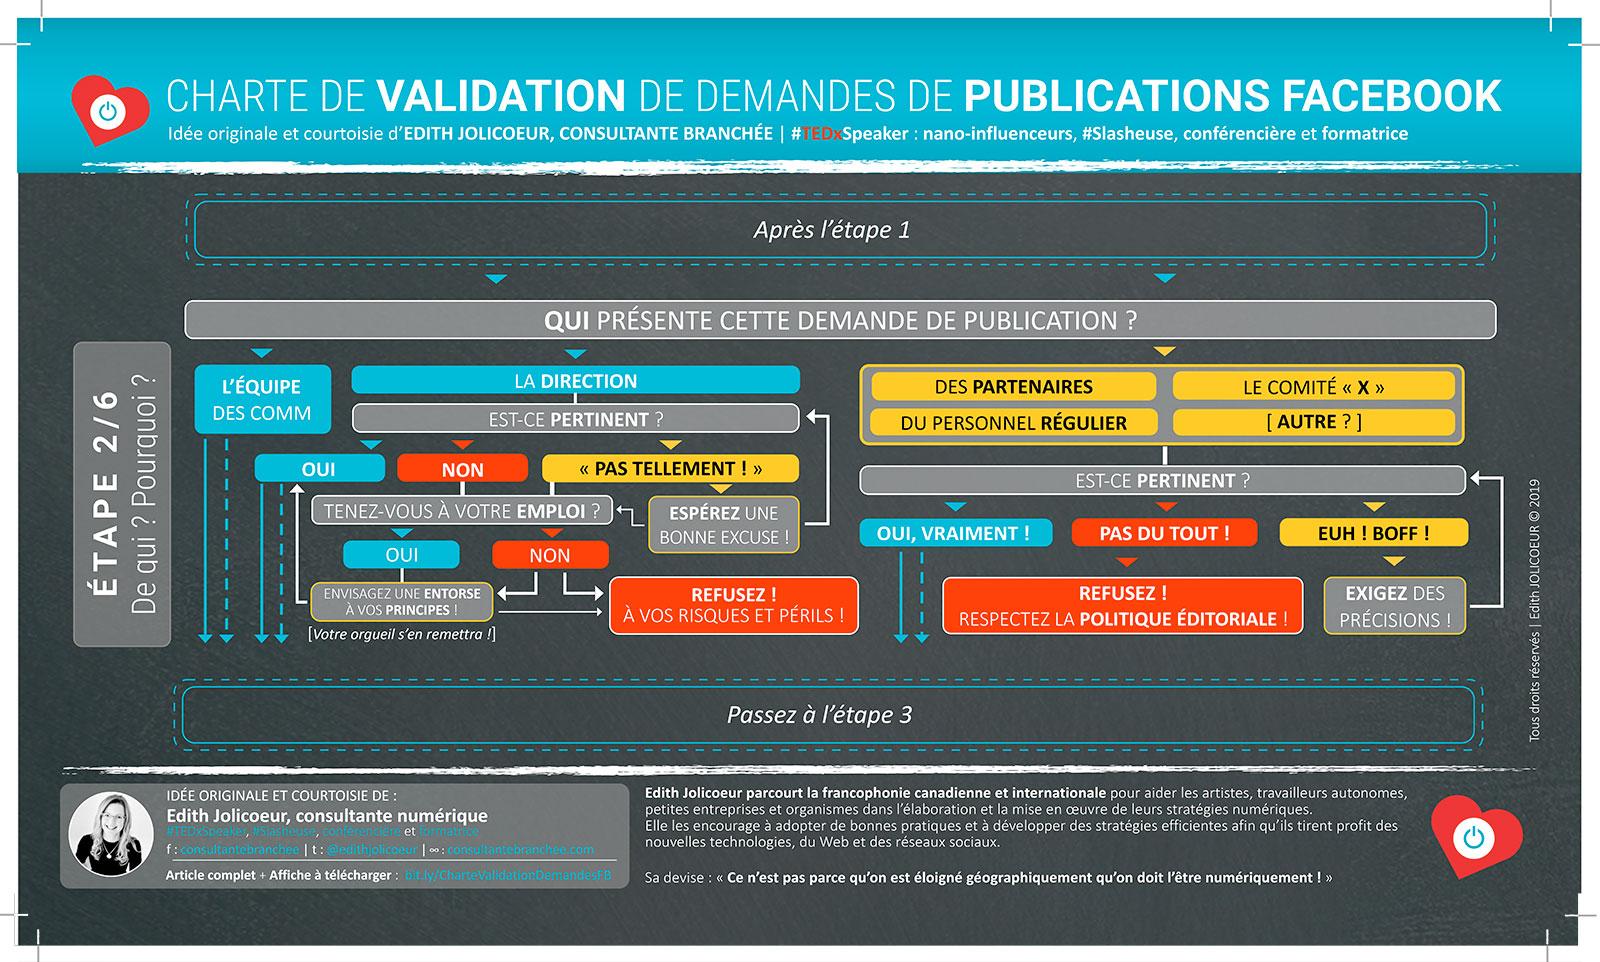 Étape 2 CHARTE DE VALIDATION de demandes de publications Facebook | Edith JOLICOEUR, consultante branchée